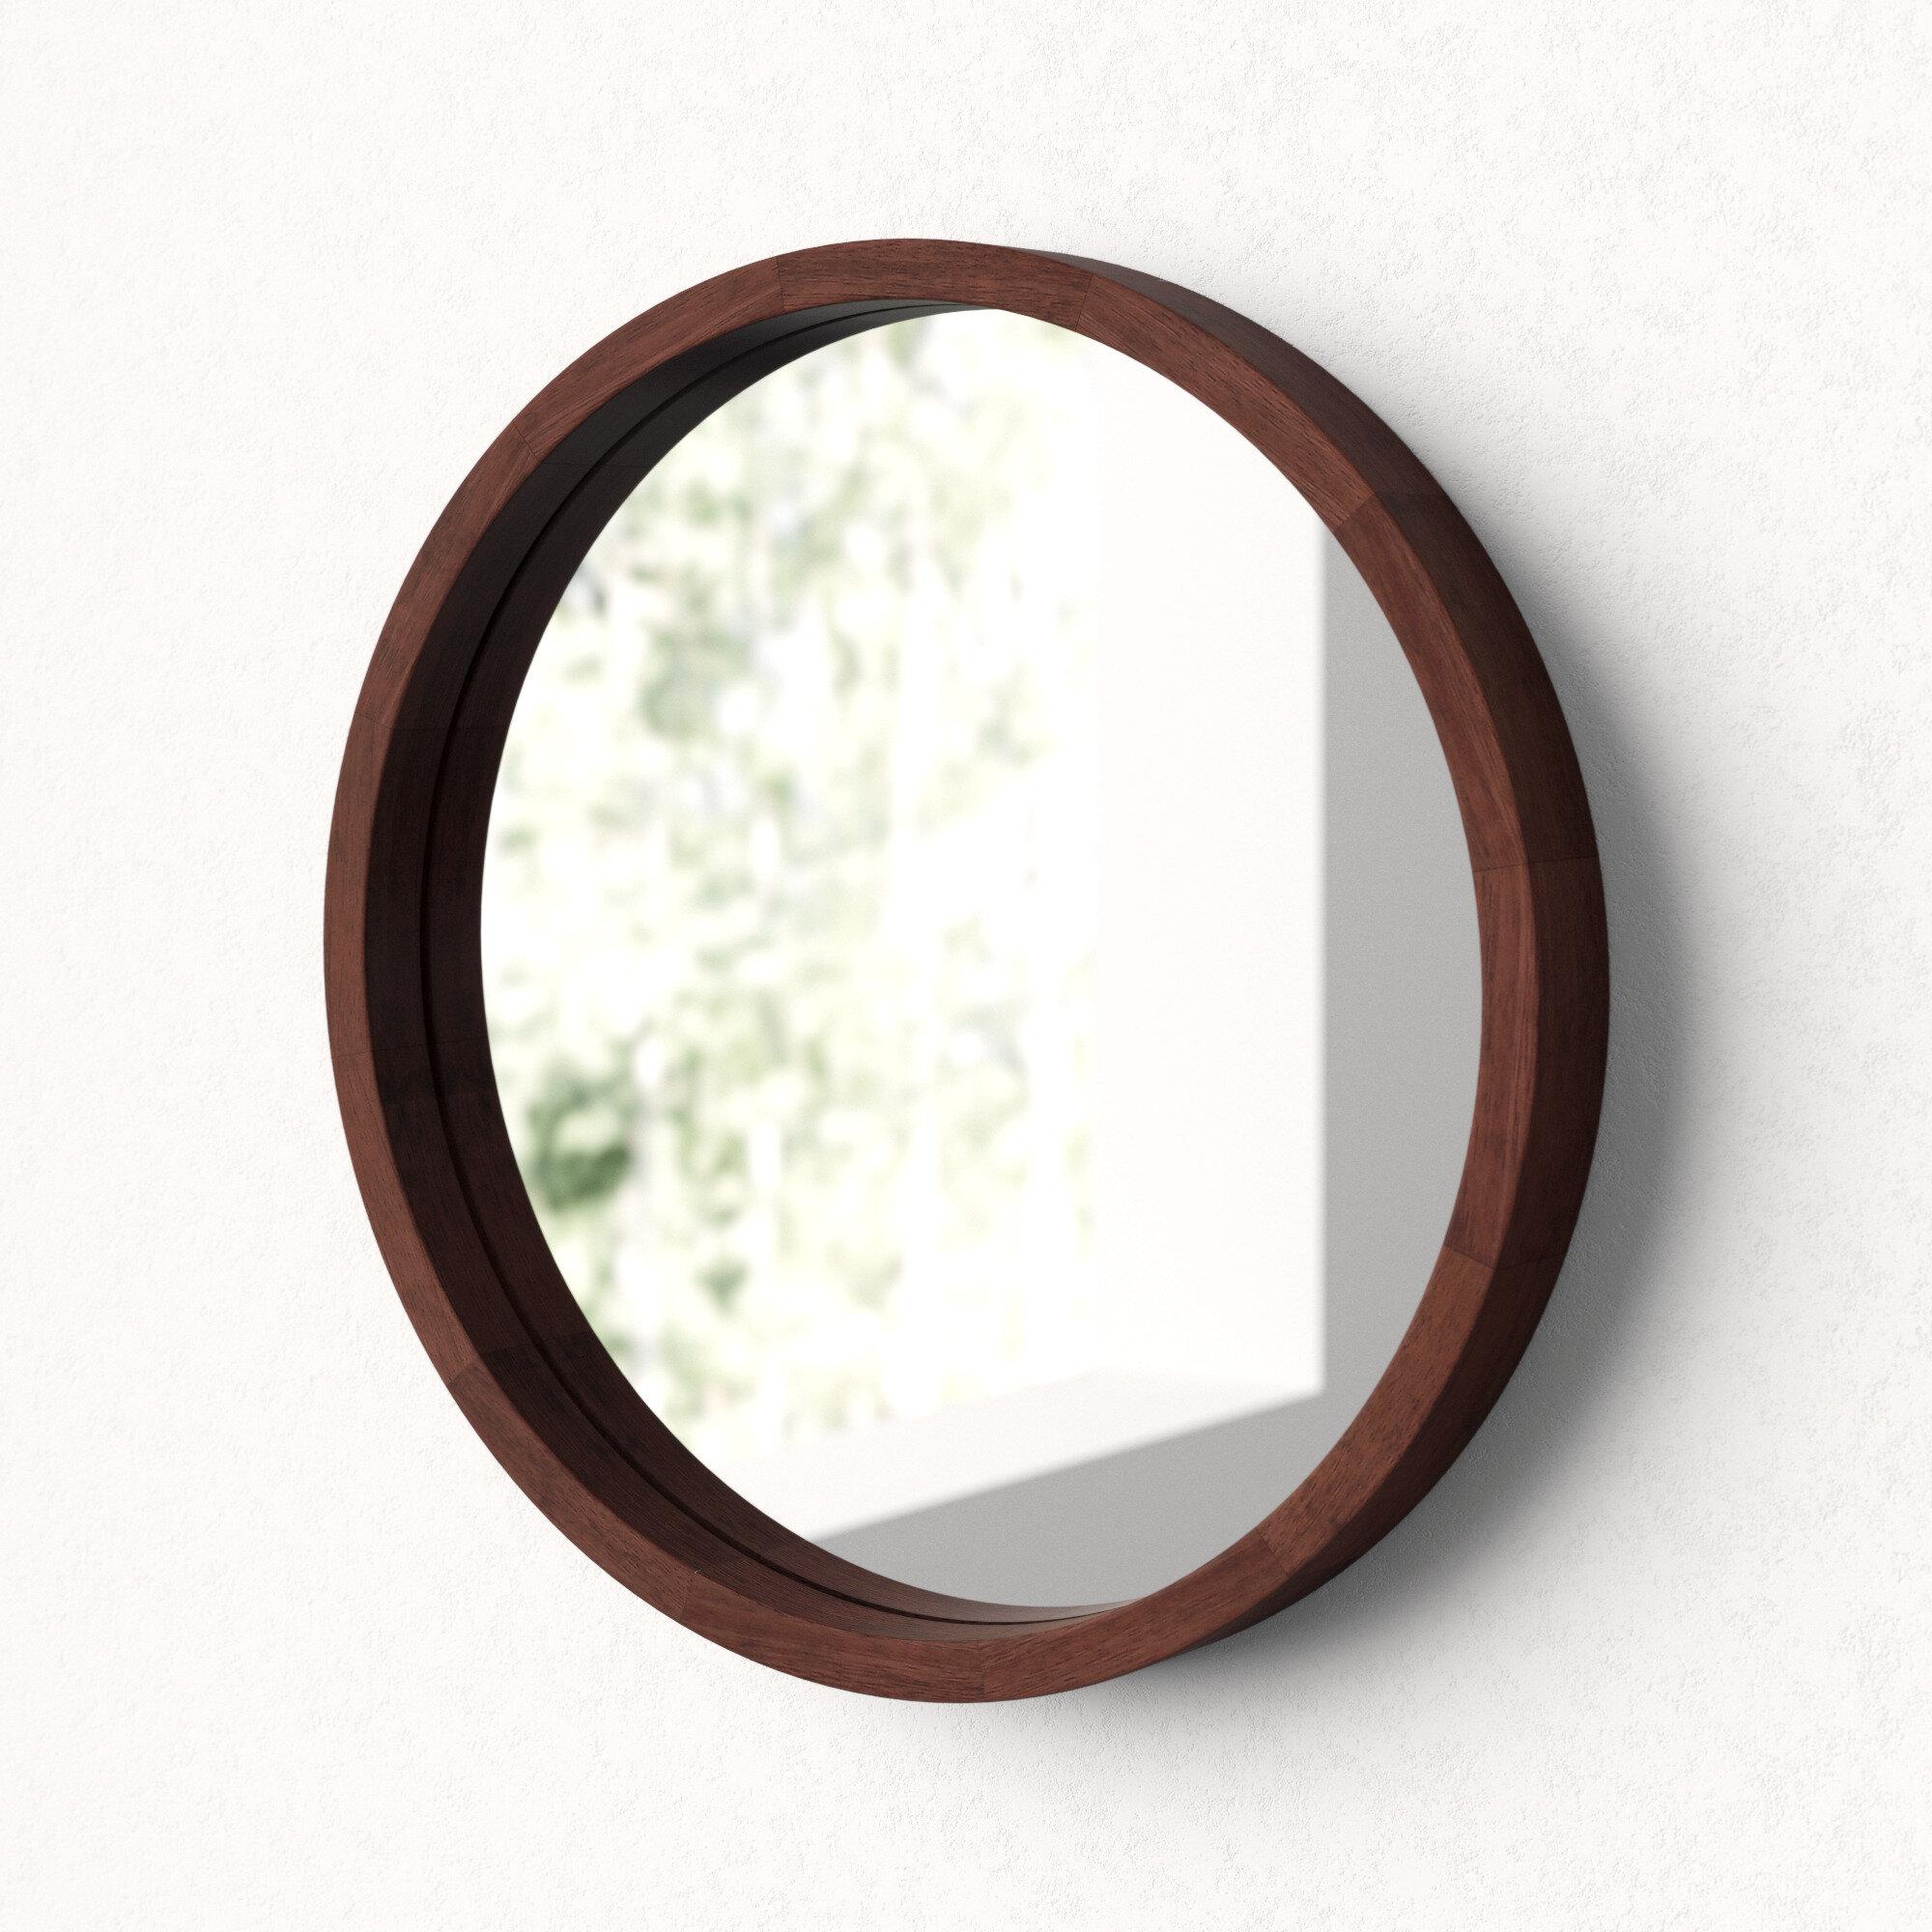 Loftis Decorative Wall Mirror